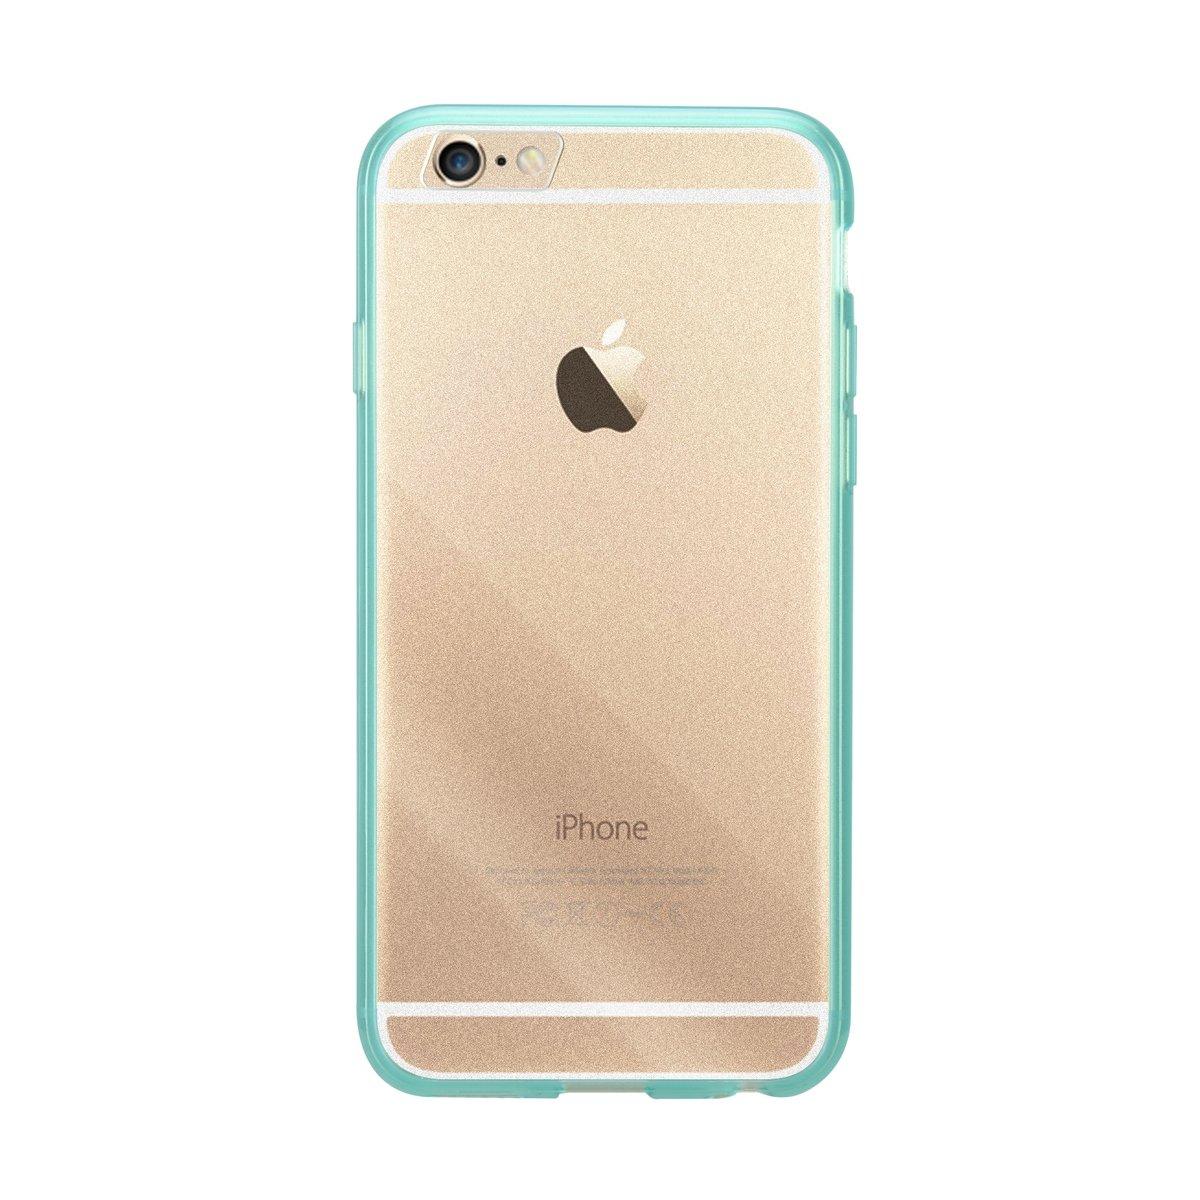 "iPhone 6 Plus/6S Plus (5.5"") PolyUltima手機保護殼 - 透明綠色(附送屏幕保護貼)"